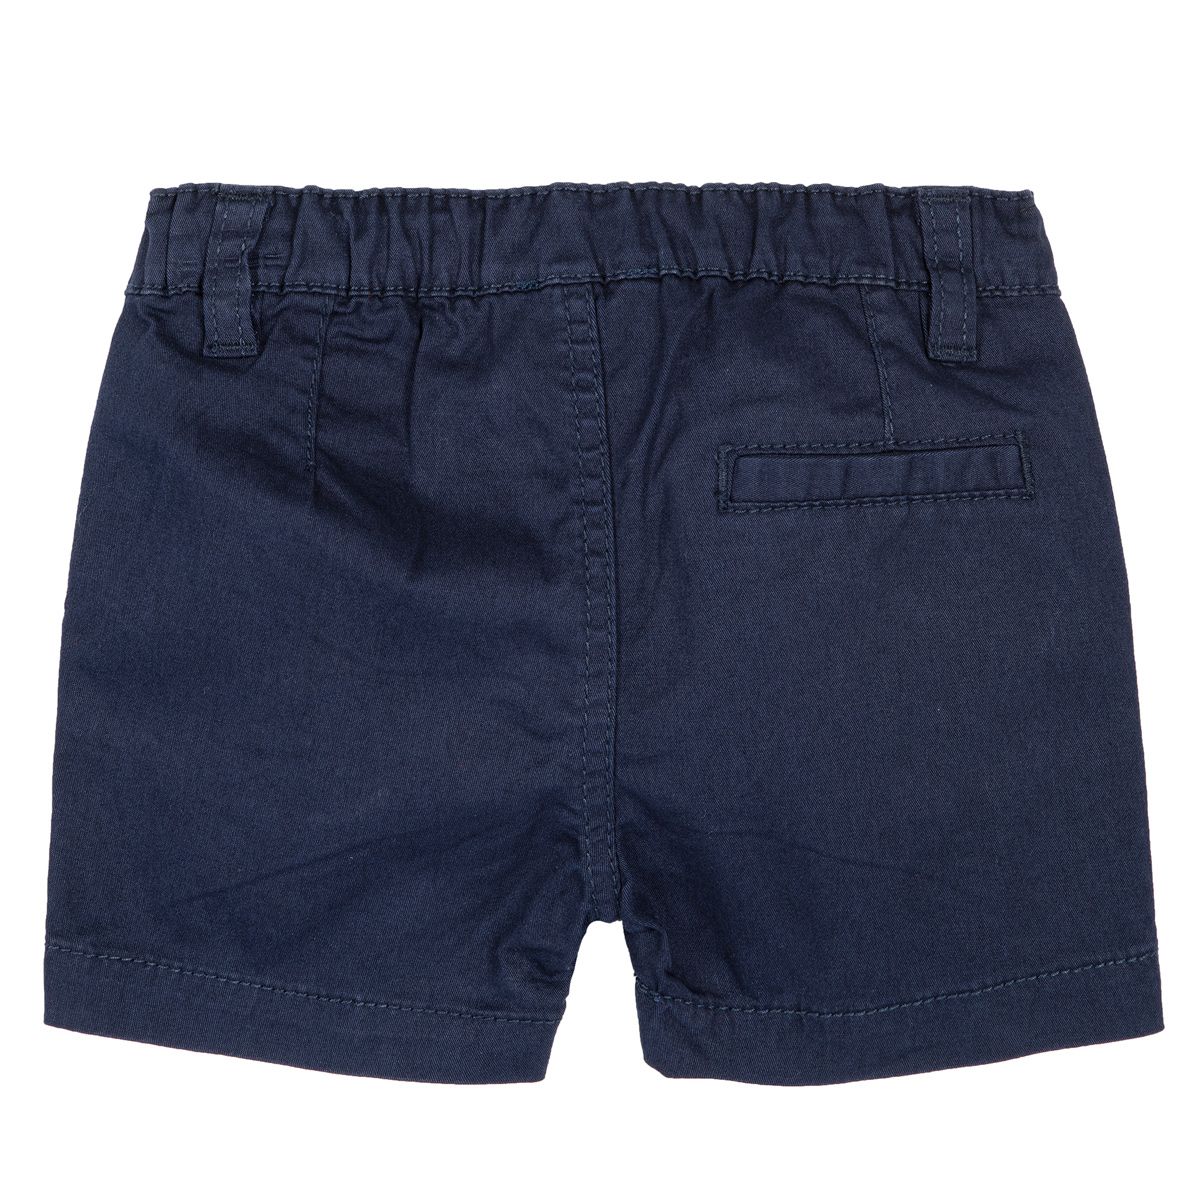 Pantalon Scurt Copii Chicco, Albastru Inchis, 52842 imagine